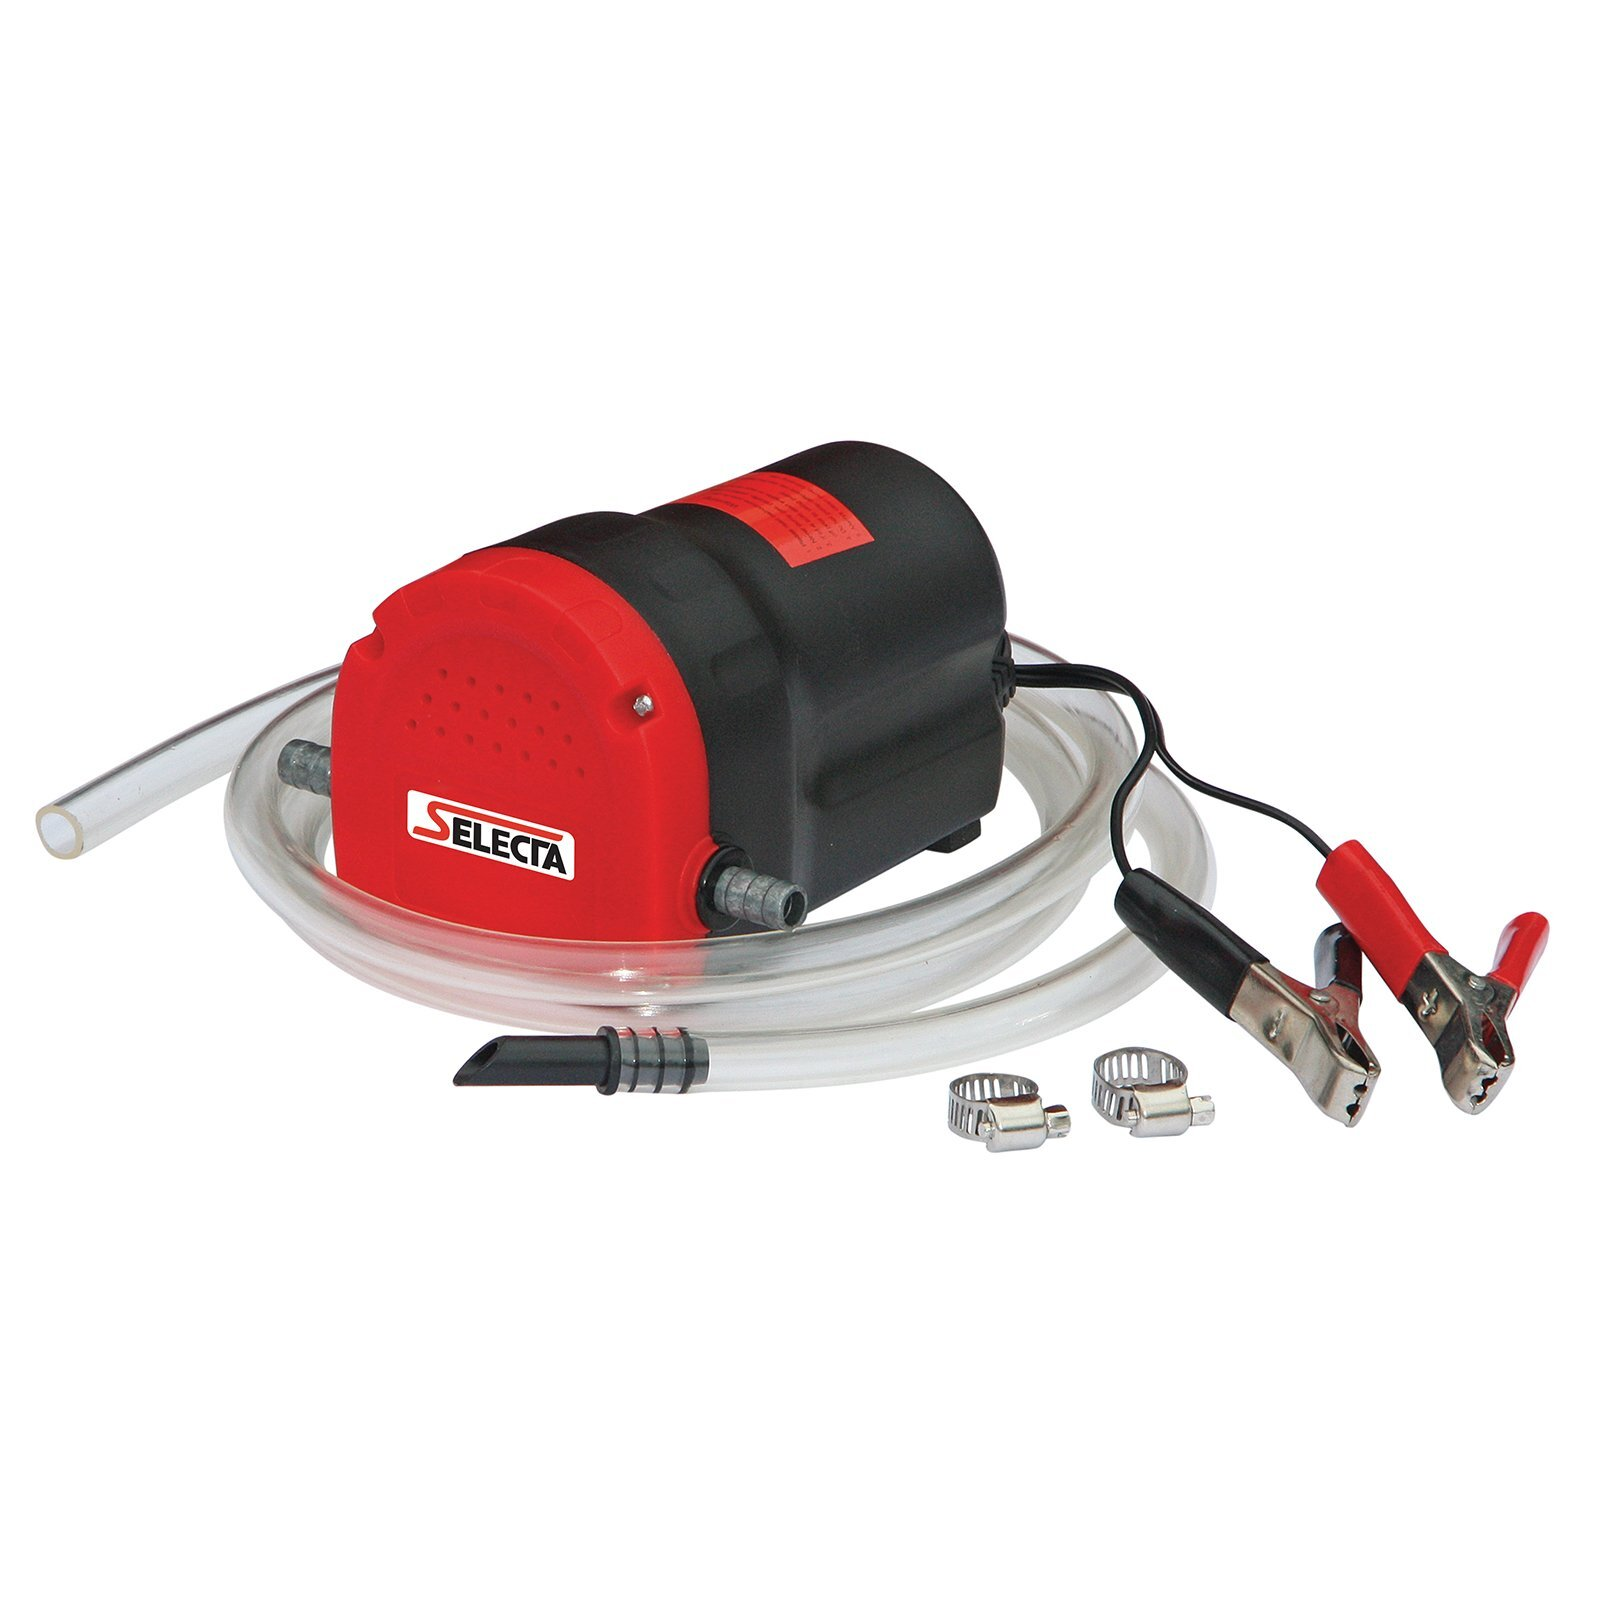 Selecta 12V Oil Change Pump Kit